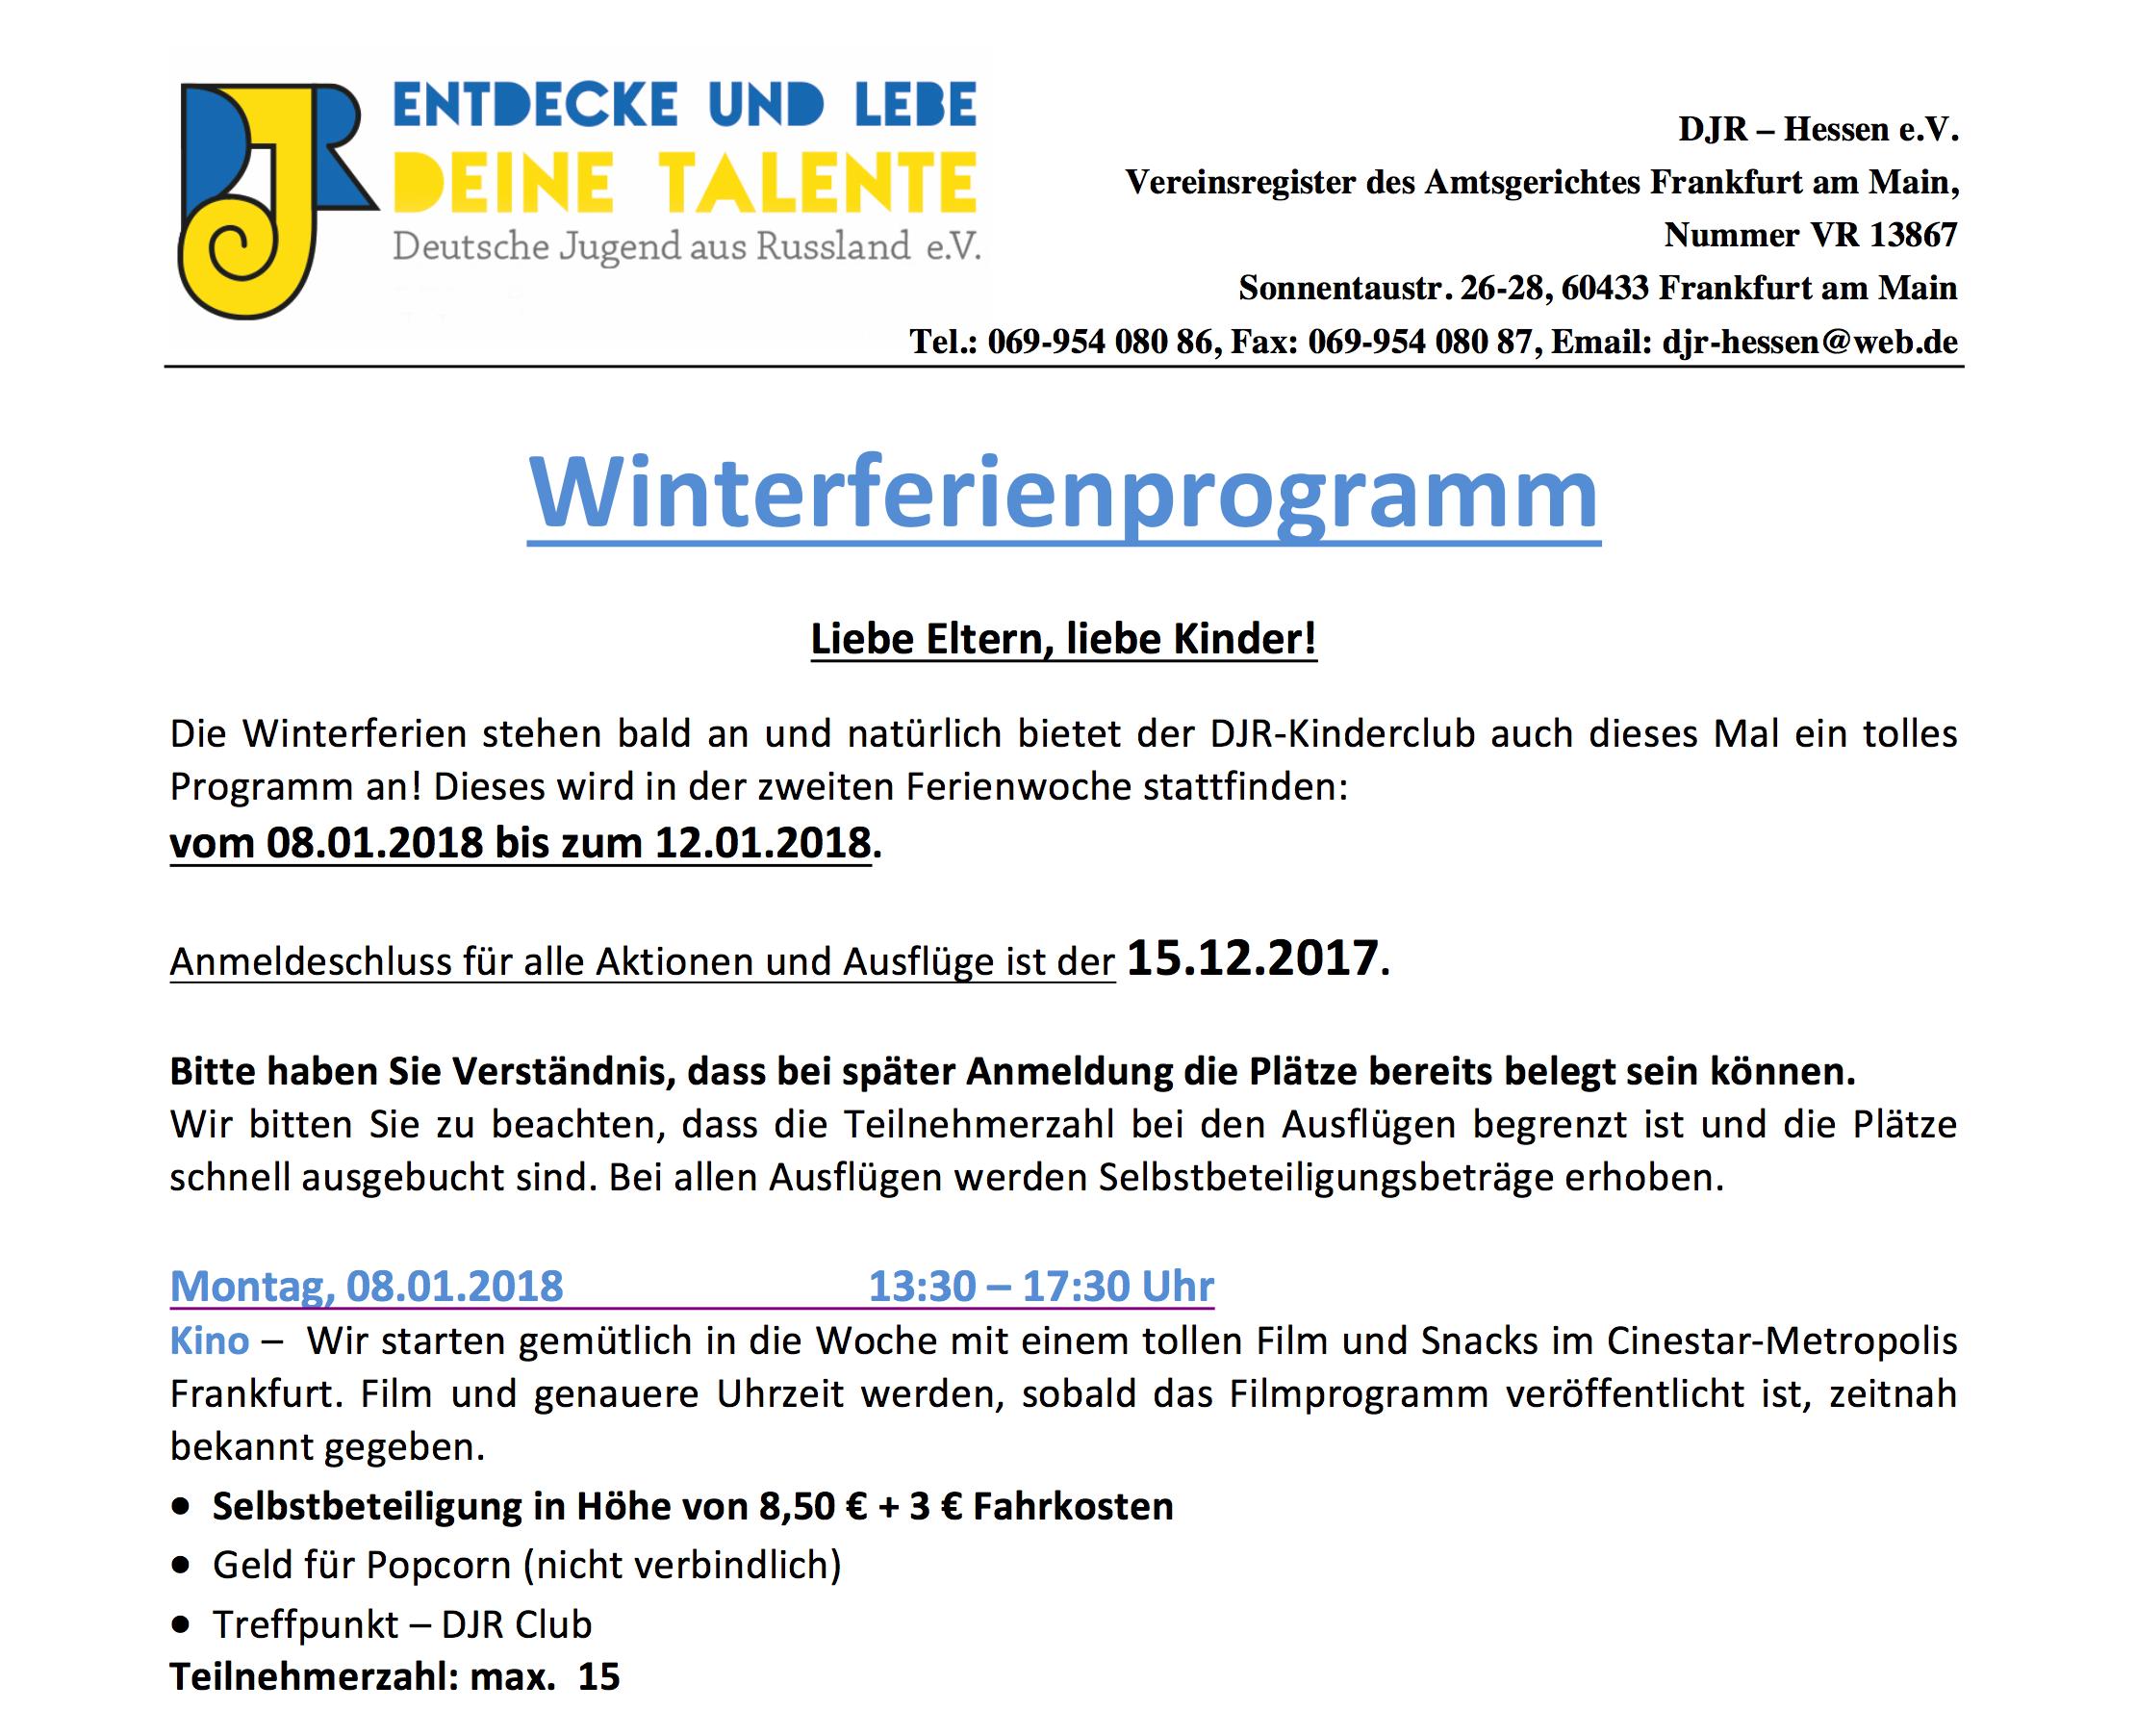 Winterferienprogramm